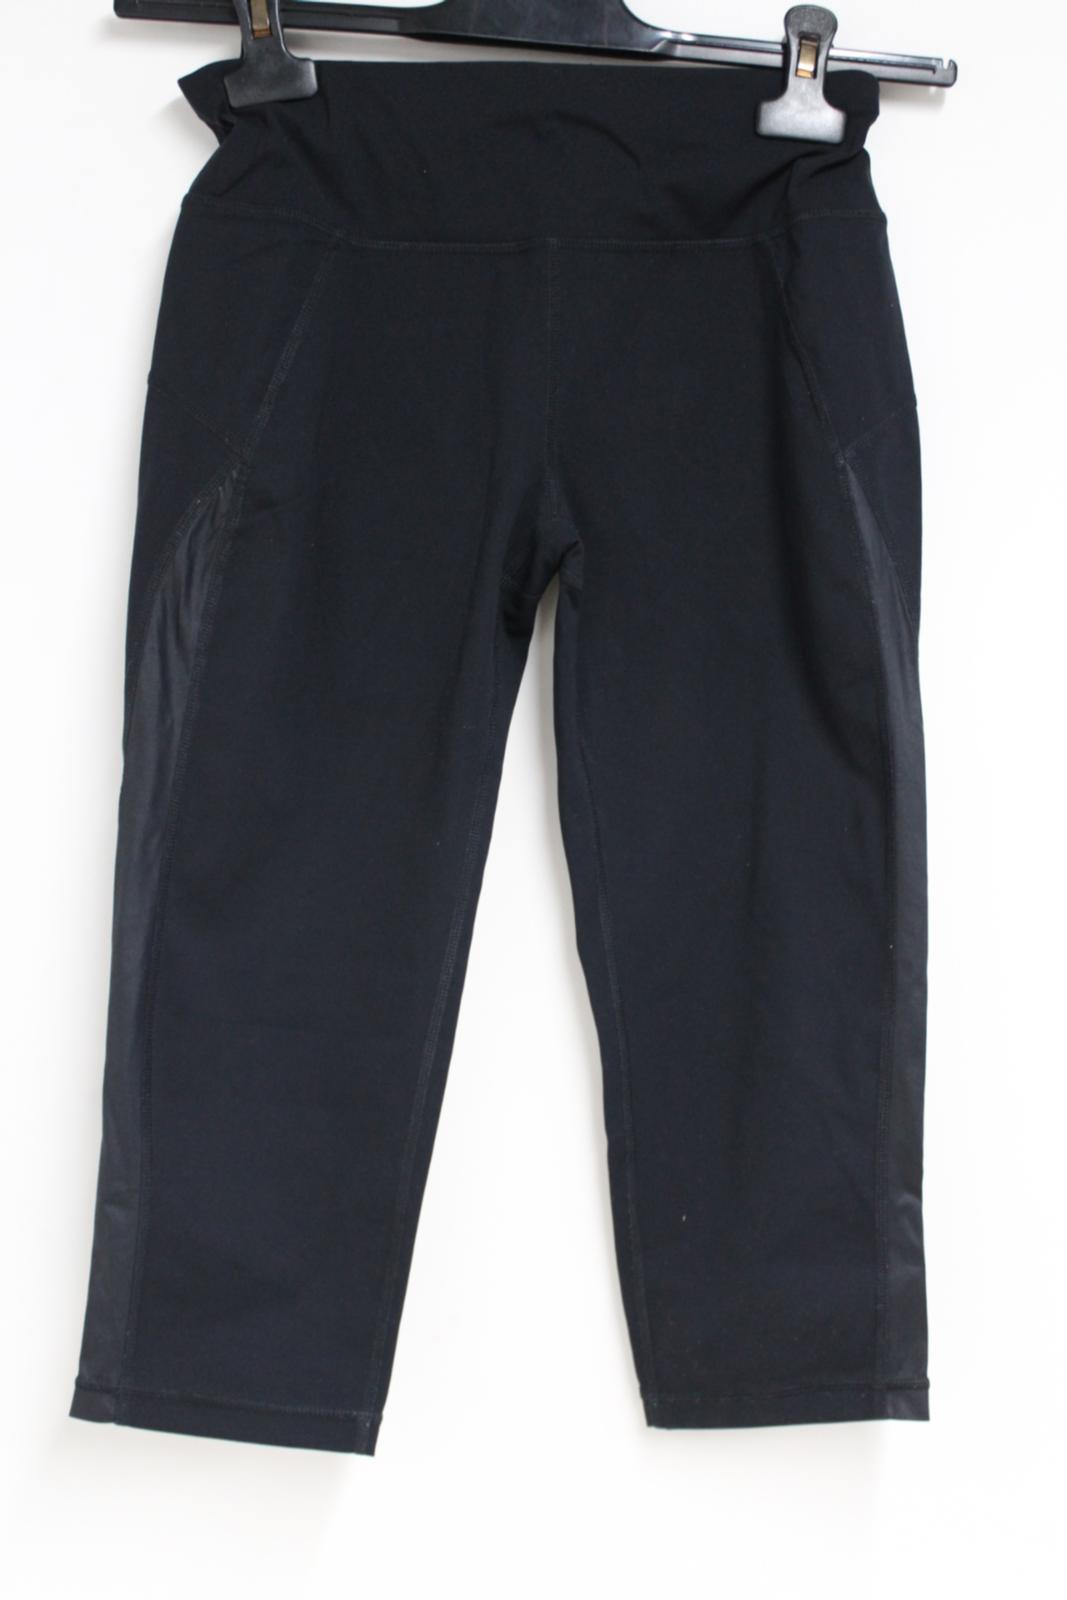 Sweaty-Betty-Ladies-Negro-3-4-piernas-Corto-Leggings-Activewear-pequeno-W26-L16 miniatura 11